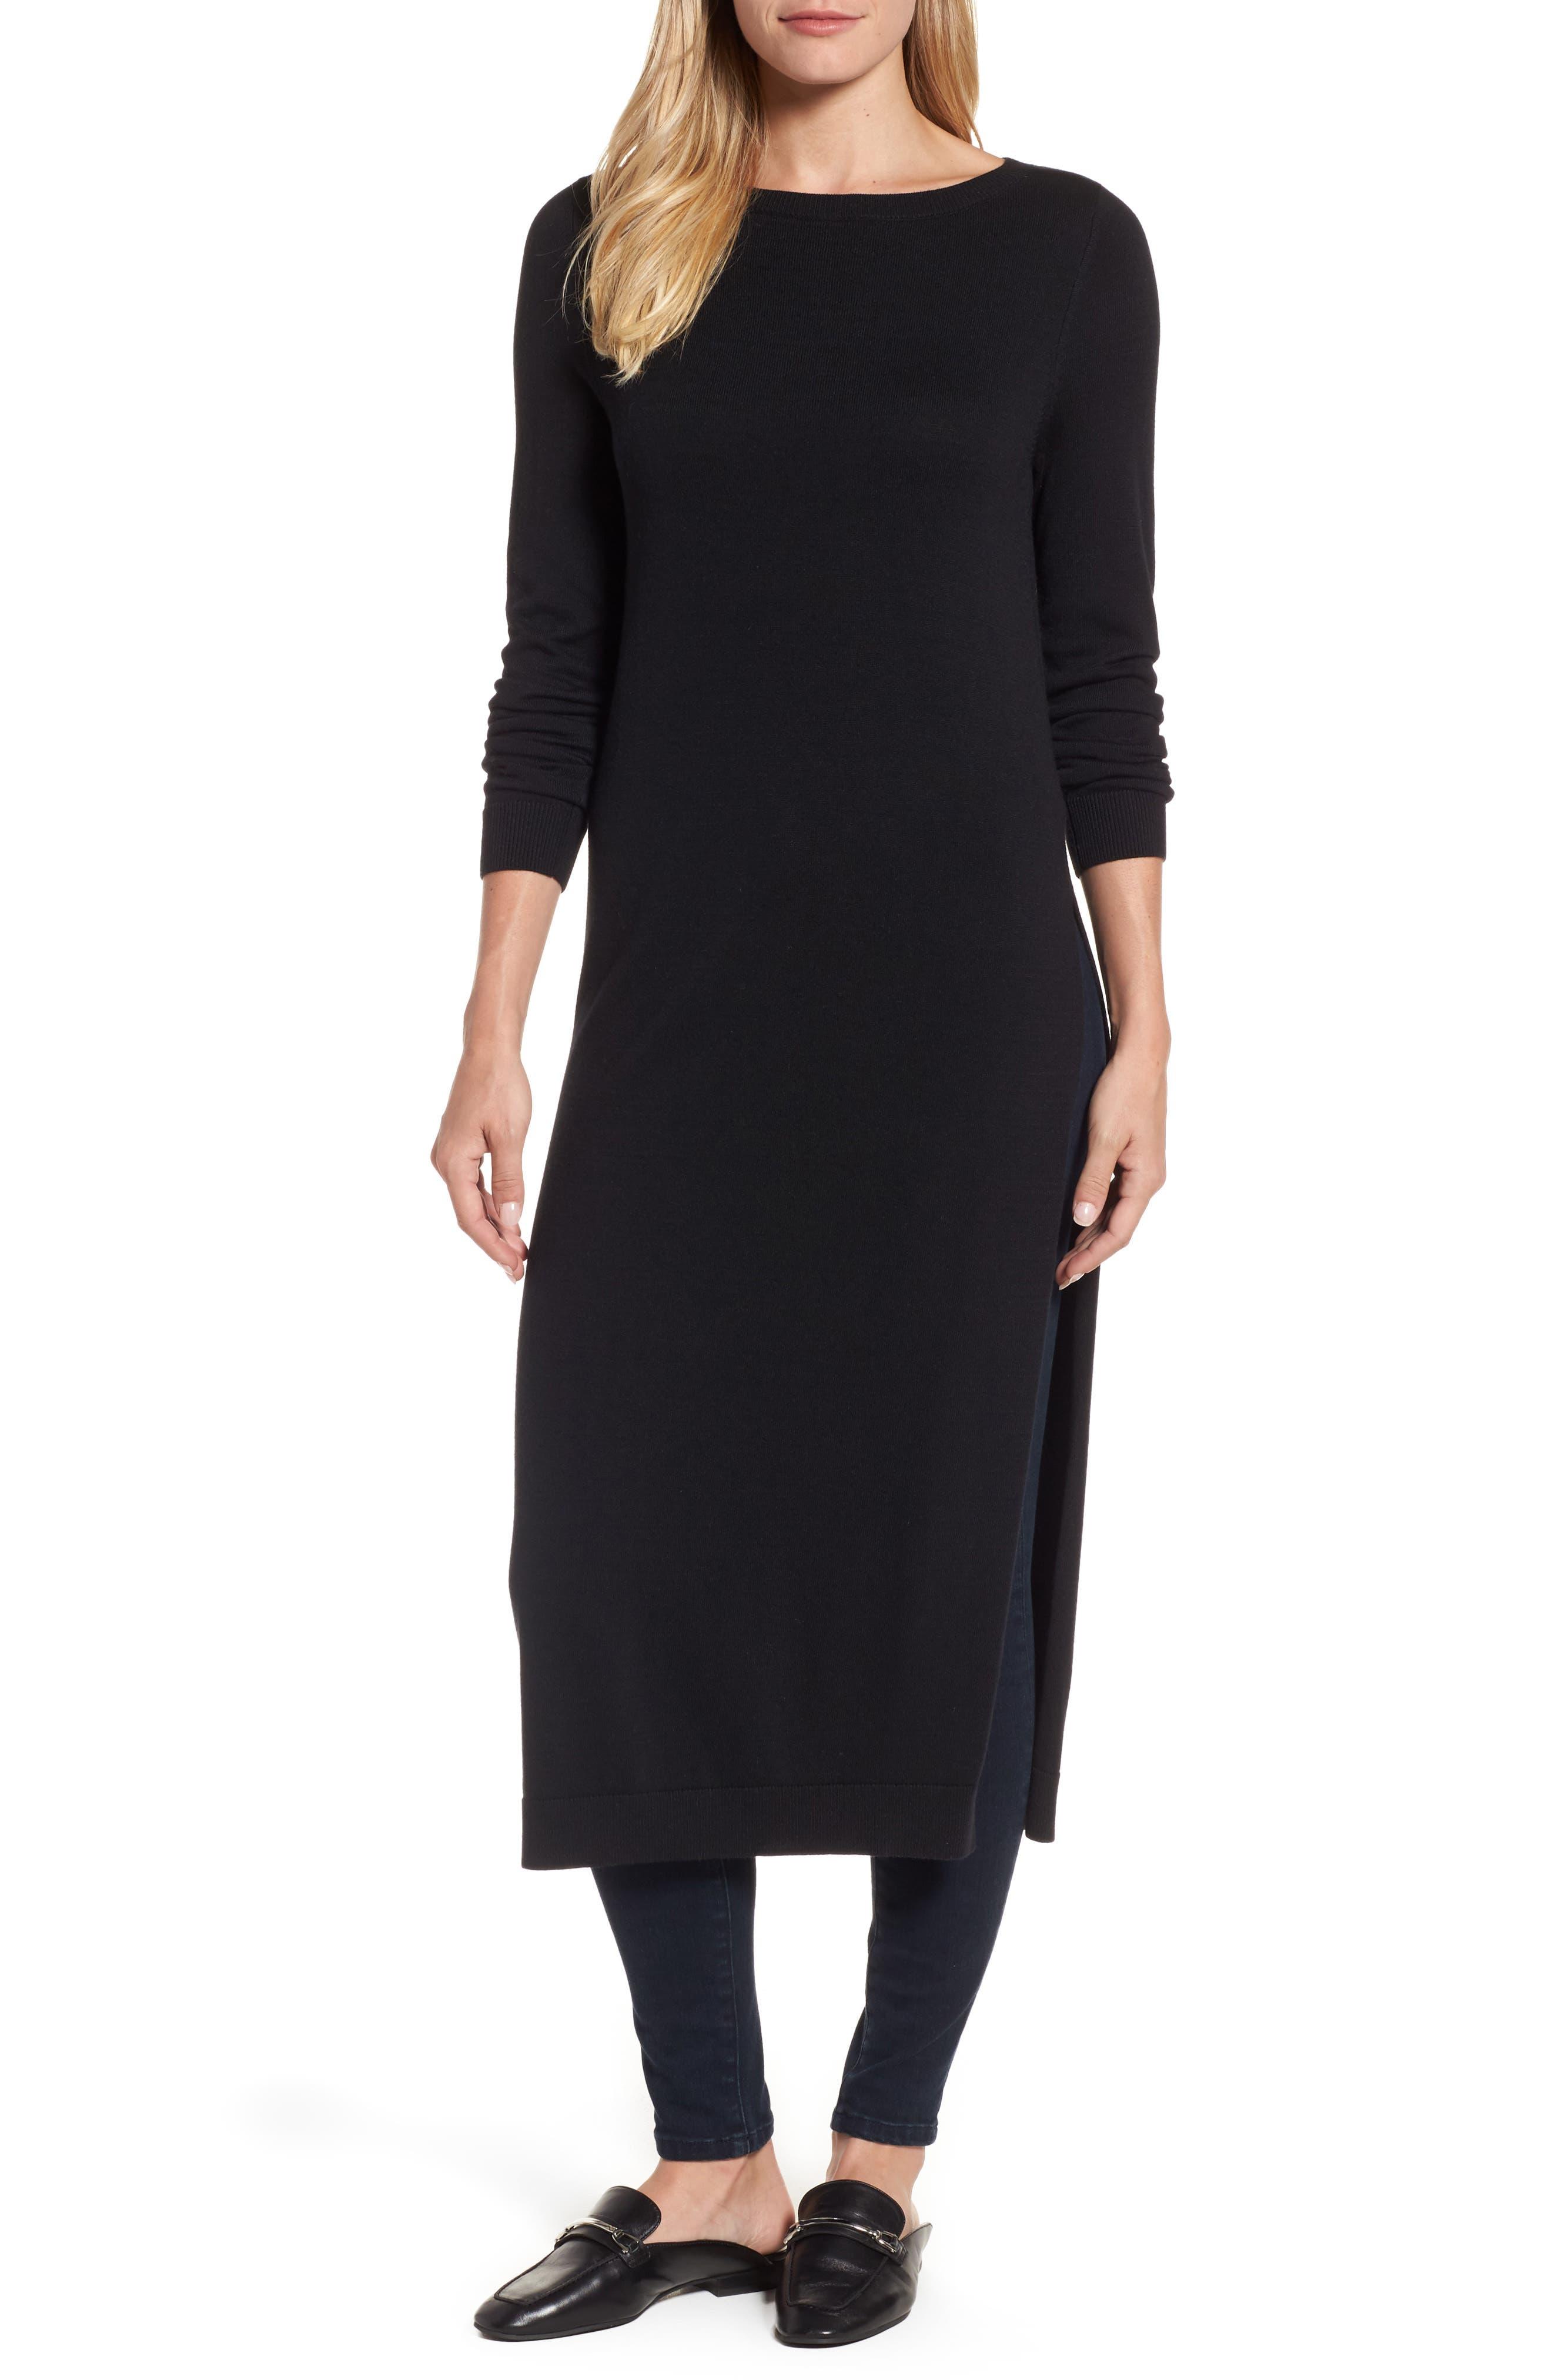 Alternate Image 1 Selected - Halogen® Side Slit Tunic Sweater